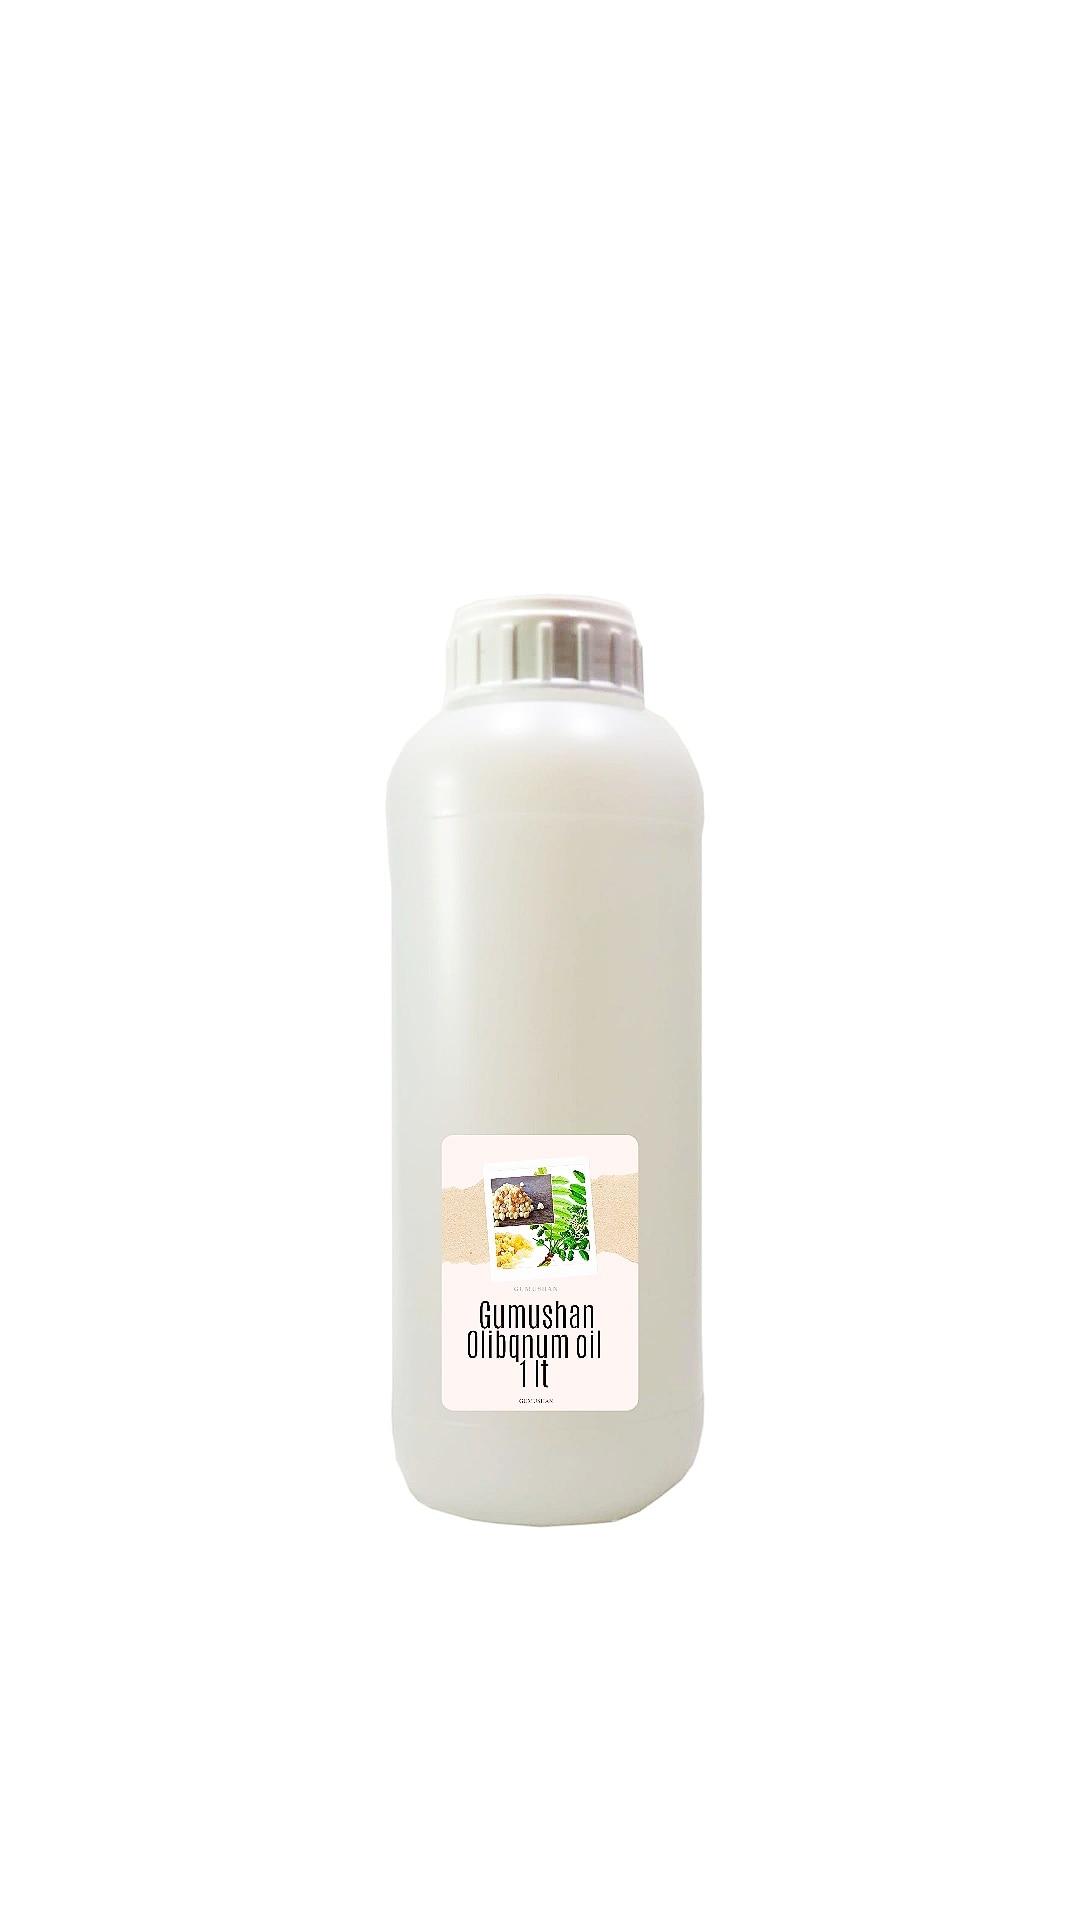 High quality pure Olibanum frankincense Oil 1 liter 34 fl oz 1000ml